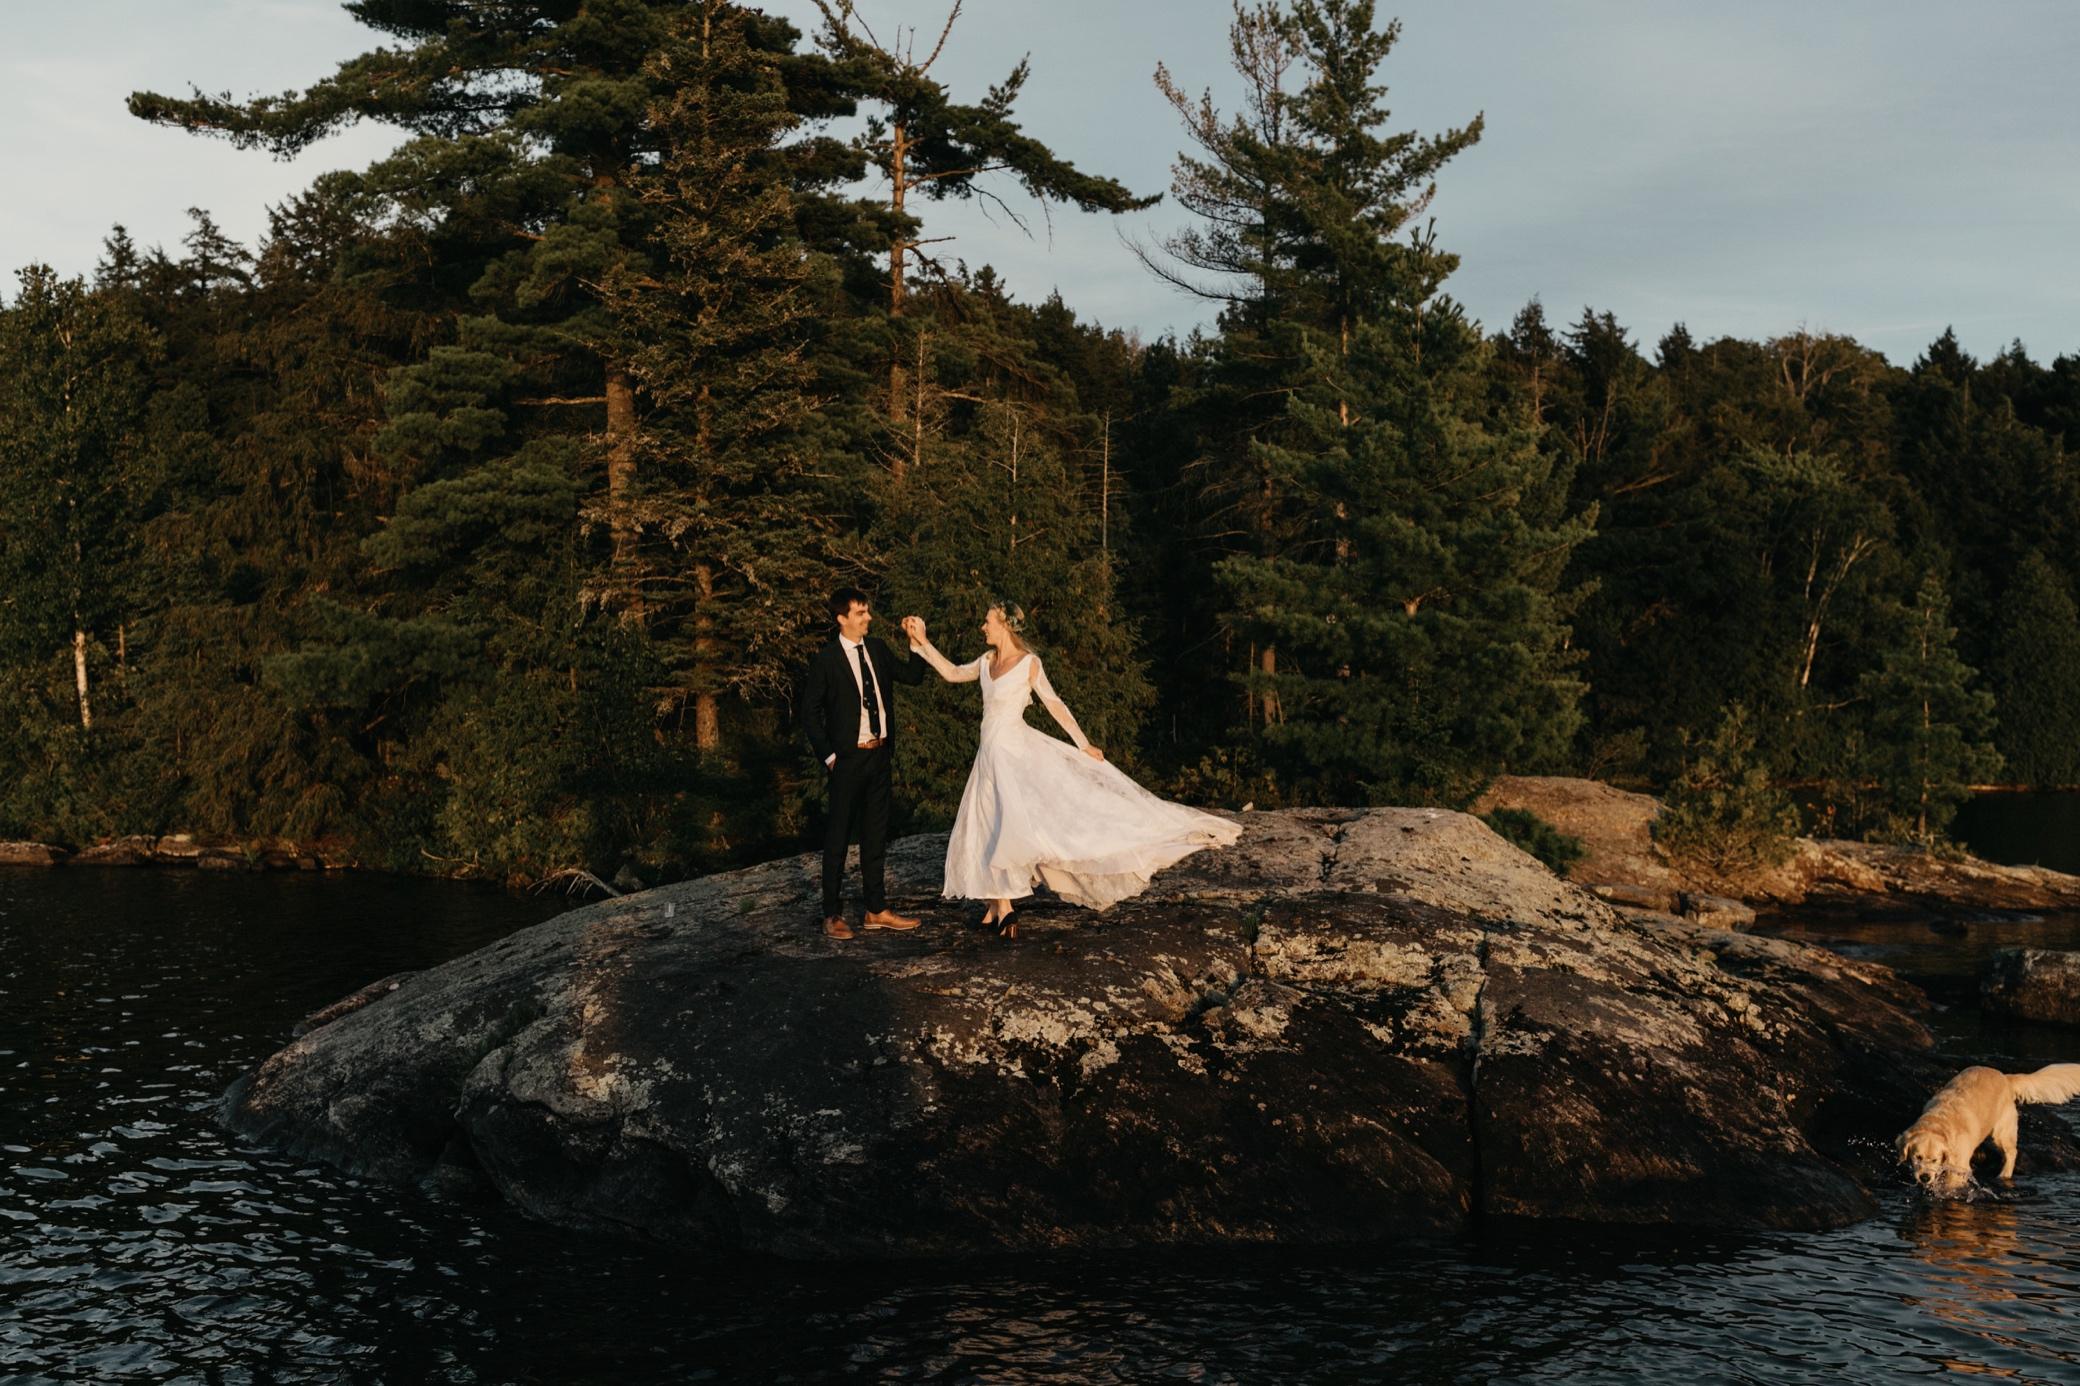 127_Huntsville Wedding  (573 of 689)_Forest_Ontario_Cottage_Huntsville_Algonquin_Wedding.jpg